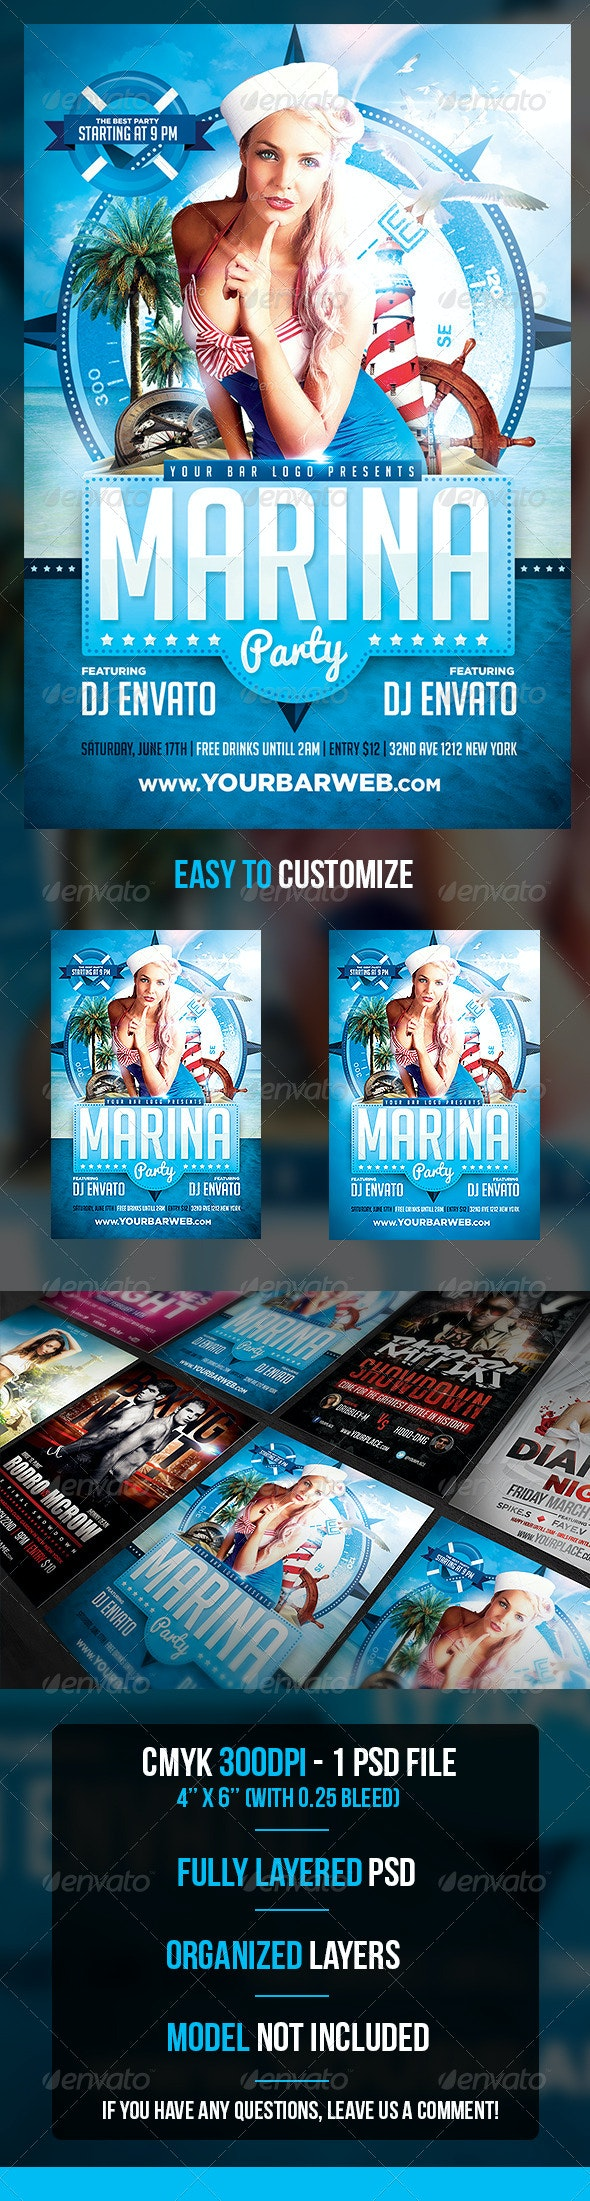 Marina Party Flyer Template - Flyers Print Templates